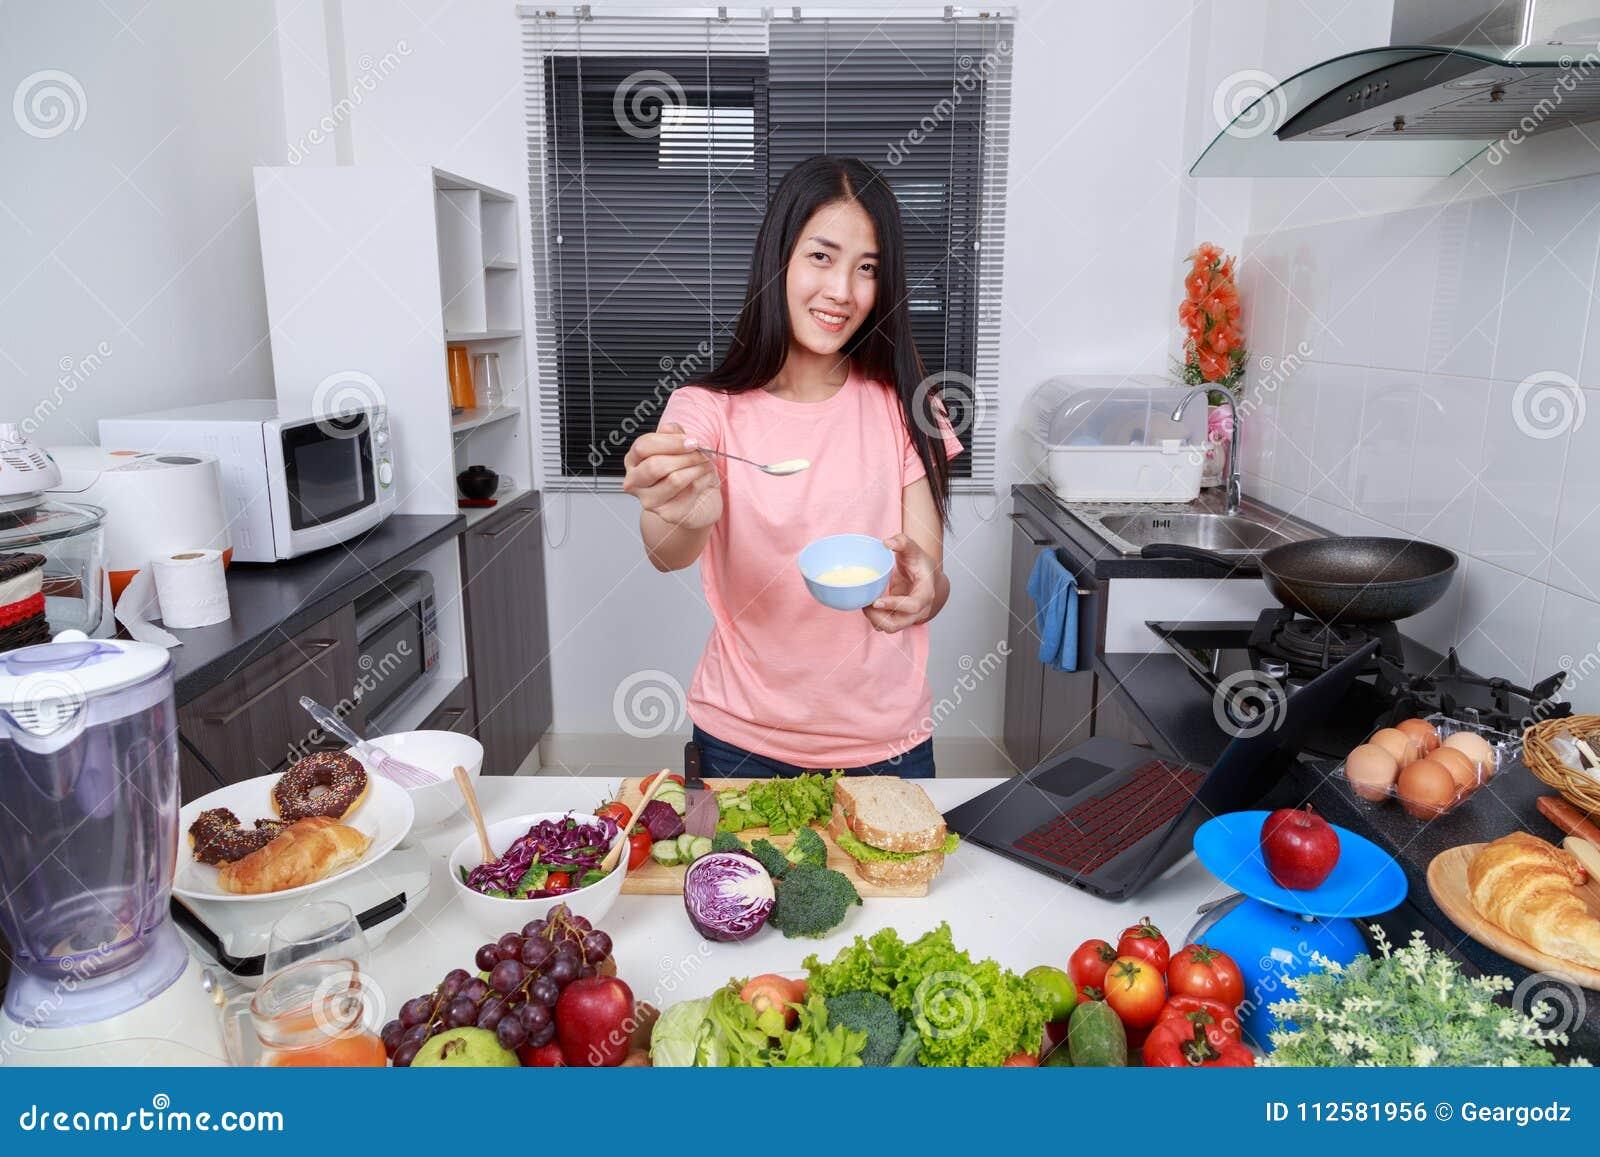 Woman in kitchen preparing salad dressing in bowl